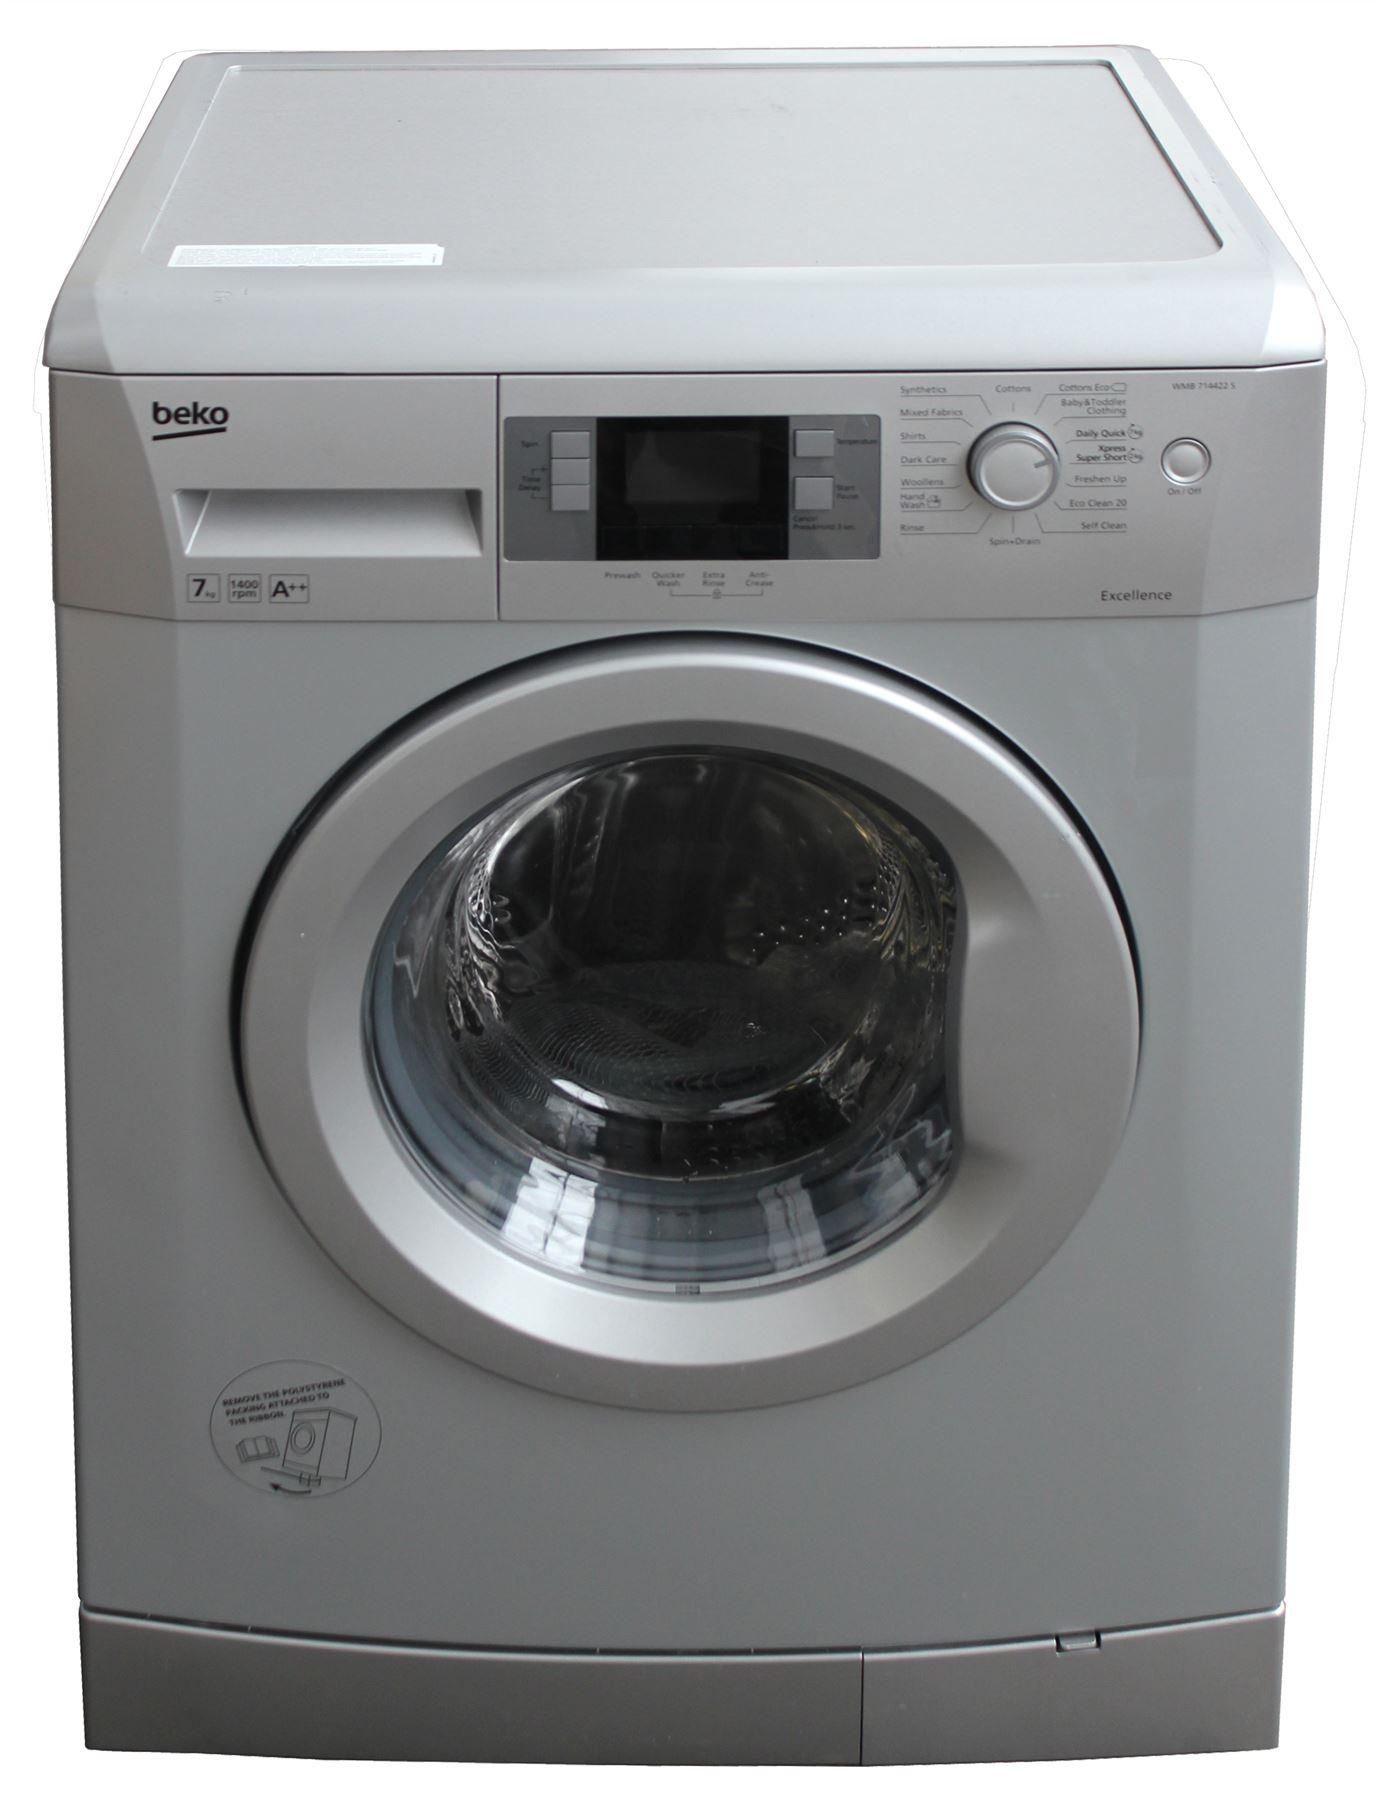 beko wmb714422s rated 7kg 1400rpm washing machine. Black Bedroom Furniture Sets. Home Design Ideas